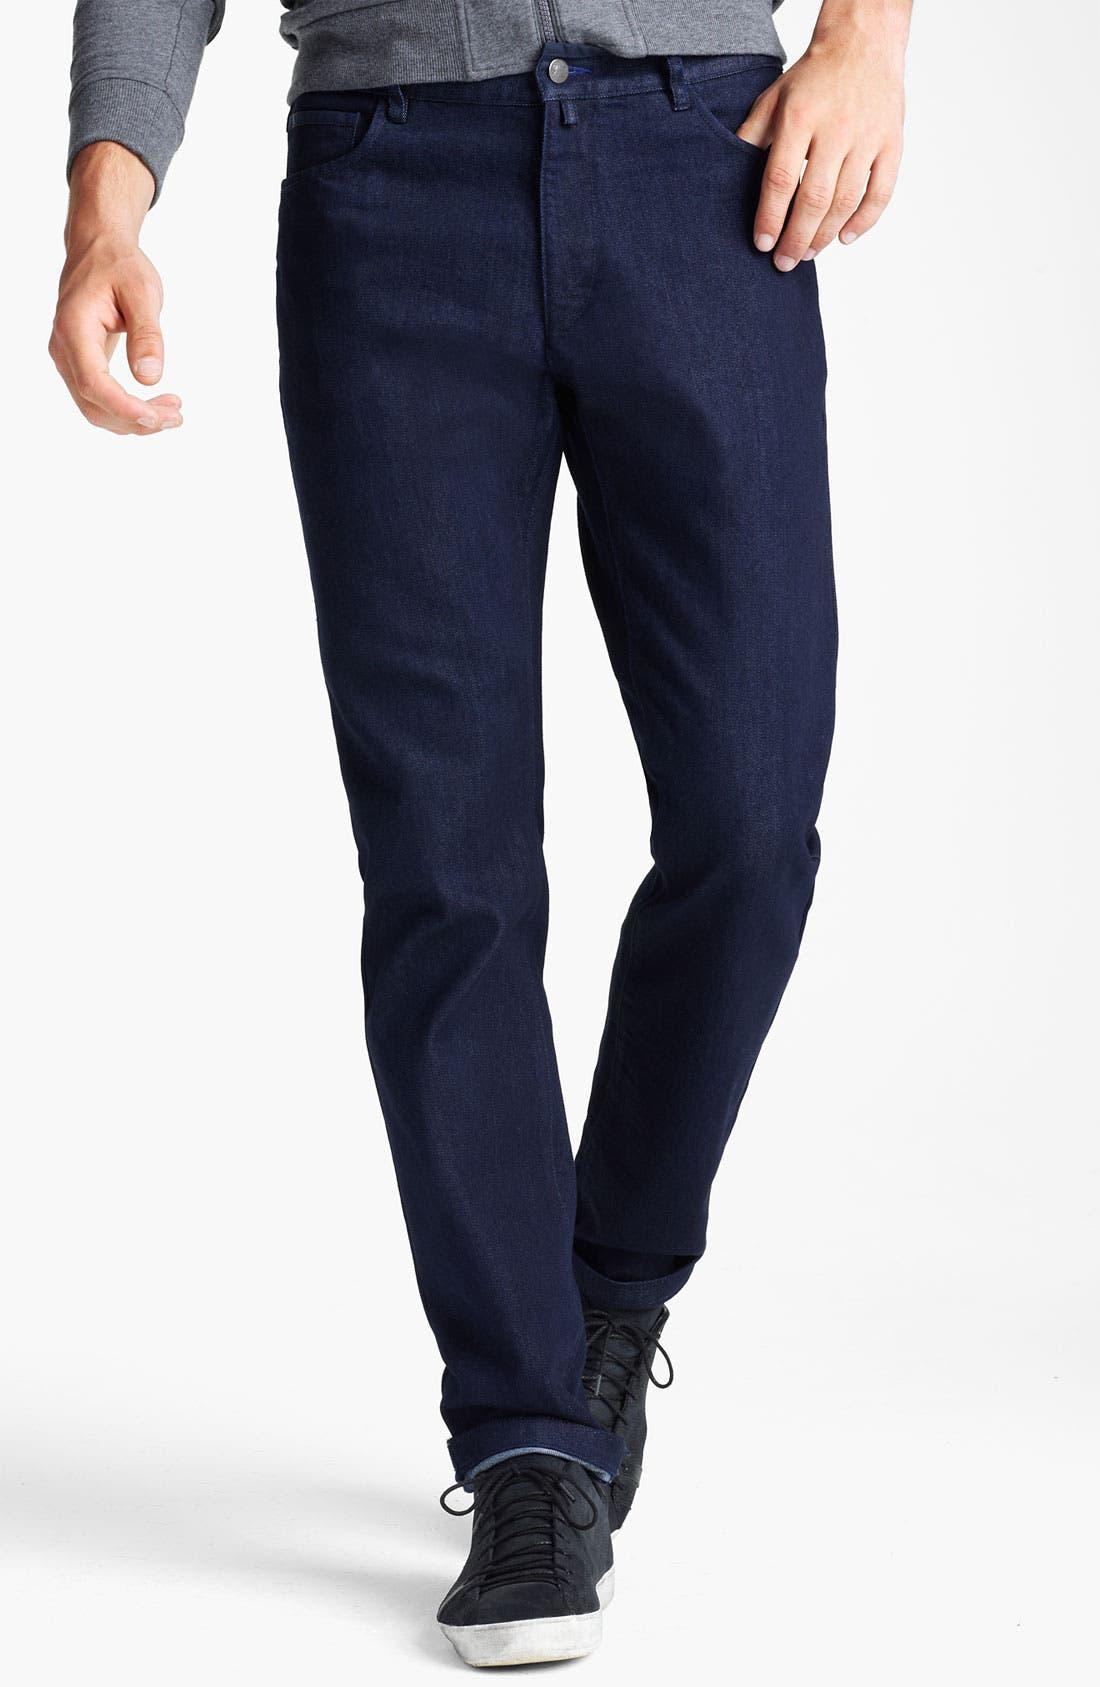 Alternate Image 1 Selected - Zegna Sport 'Cool Max' Straight Leg Jeans (Dark Blue)